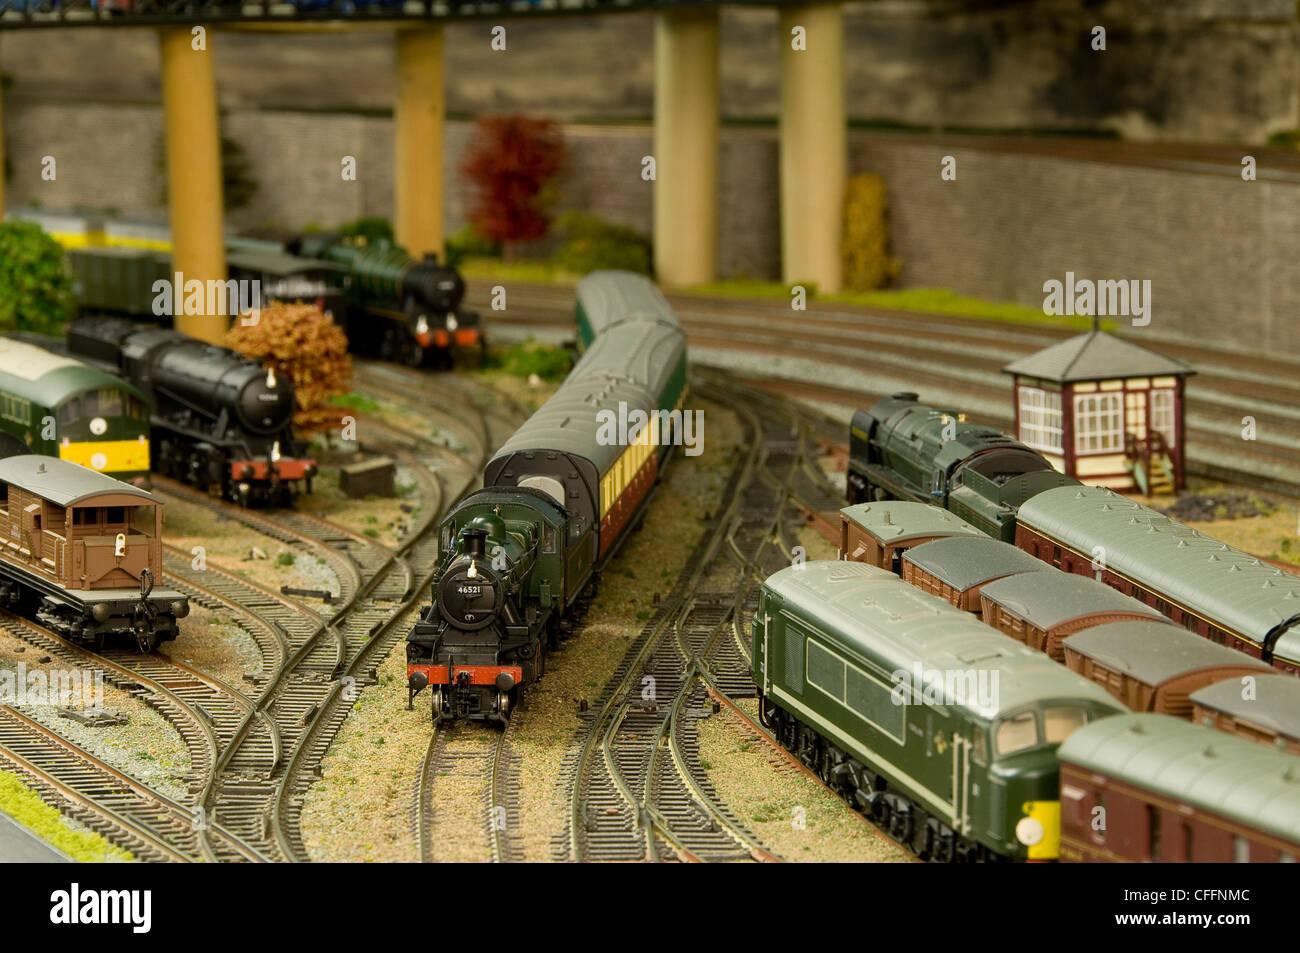 Model Railway Stock Photos & Model Railway Stock Images - Alamy